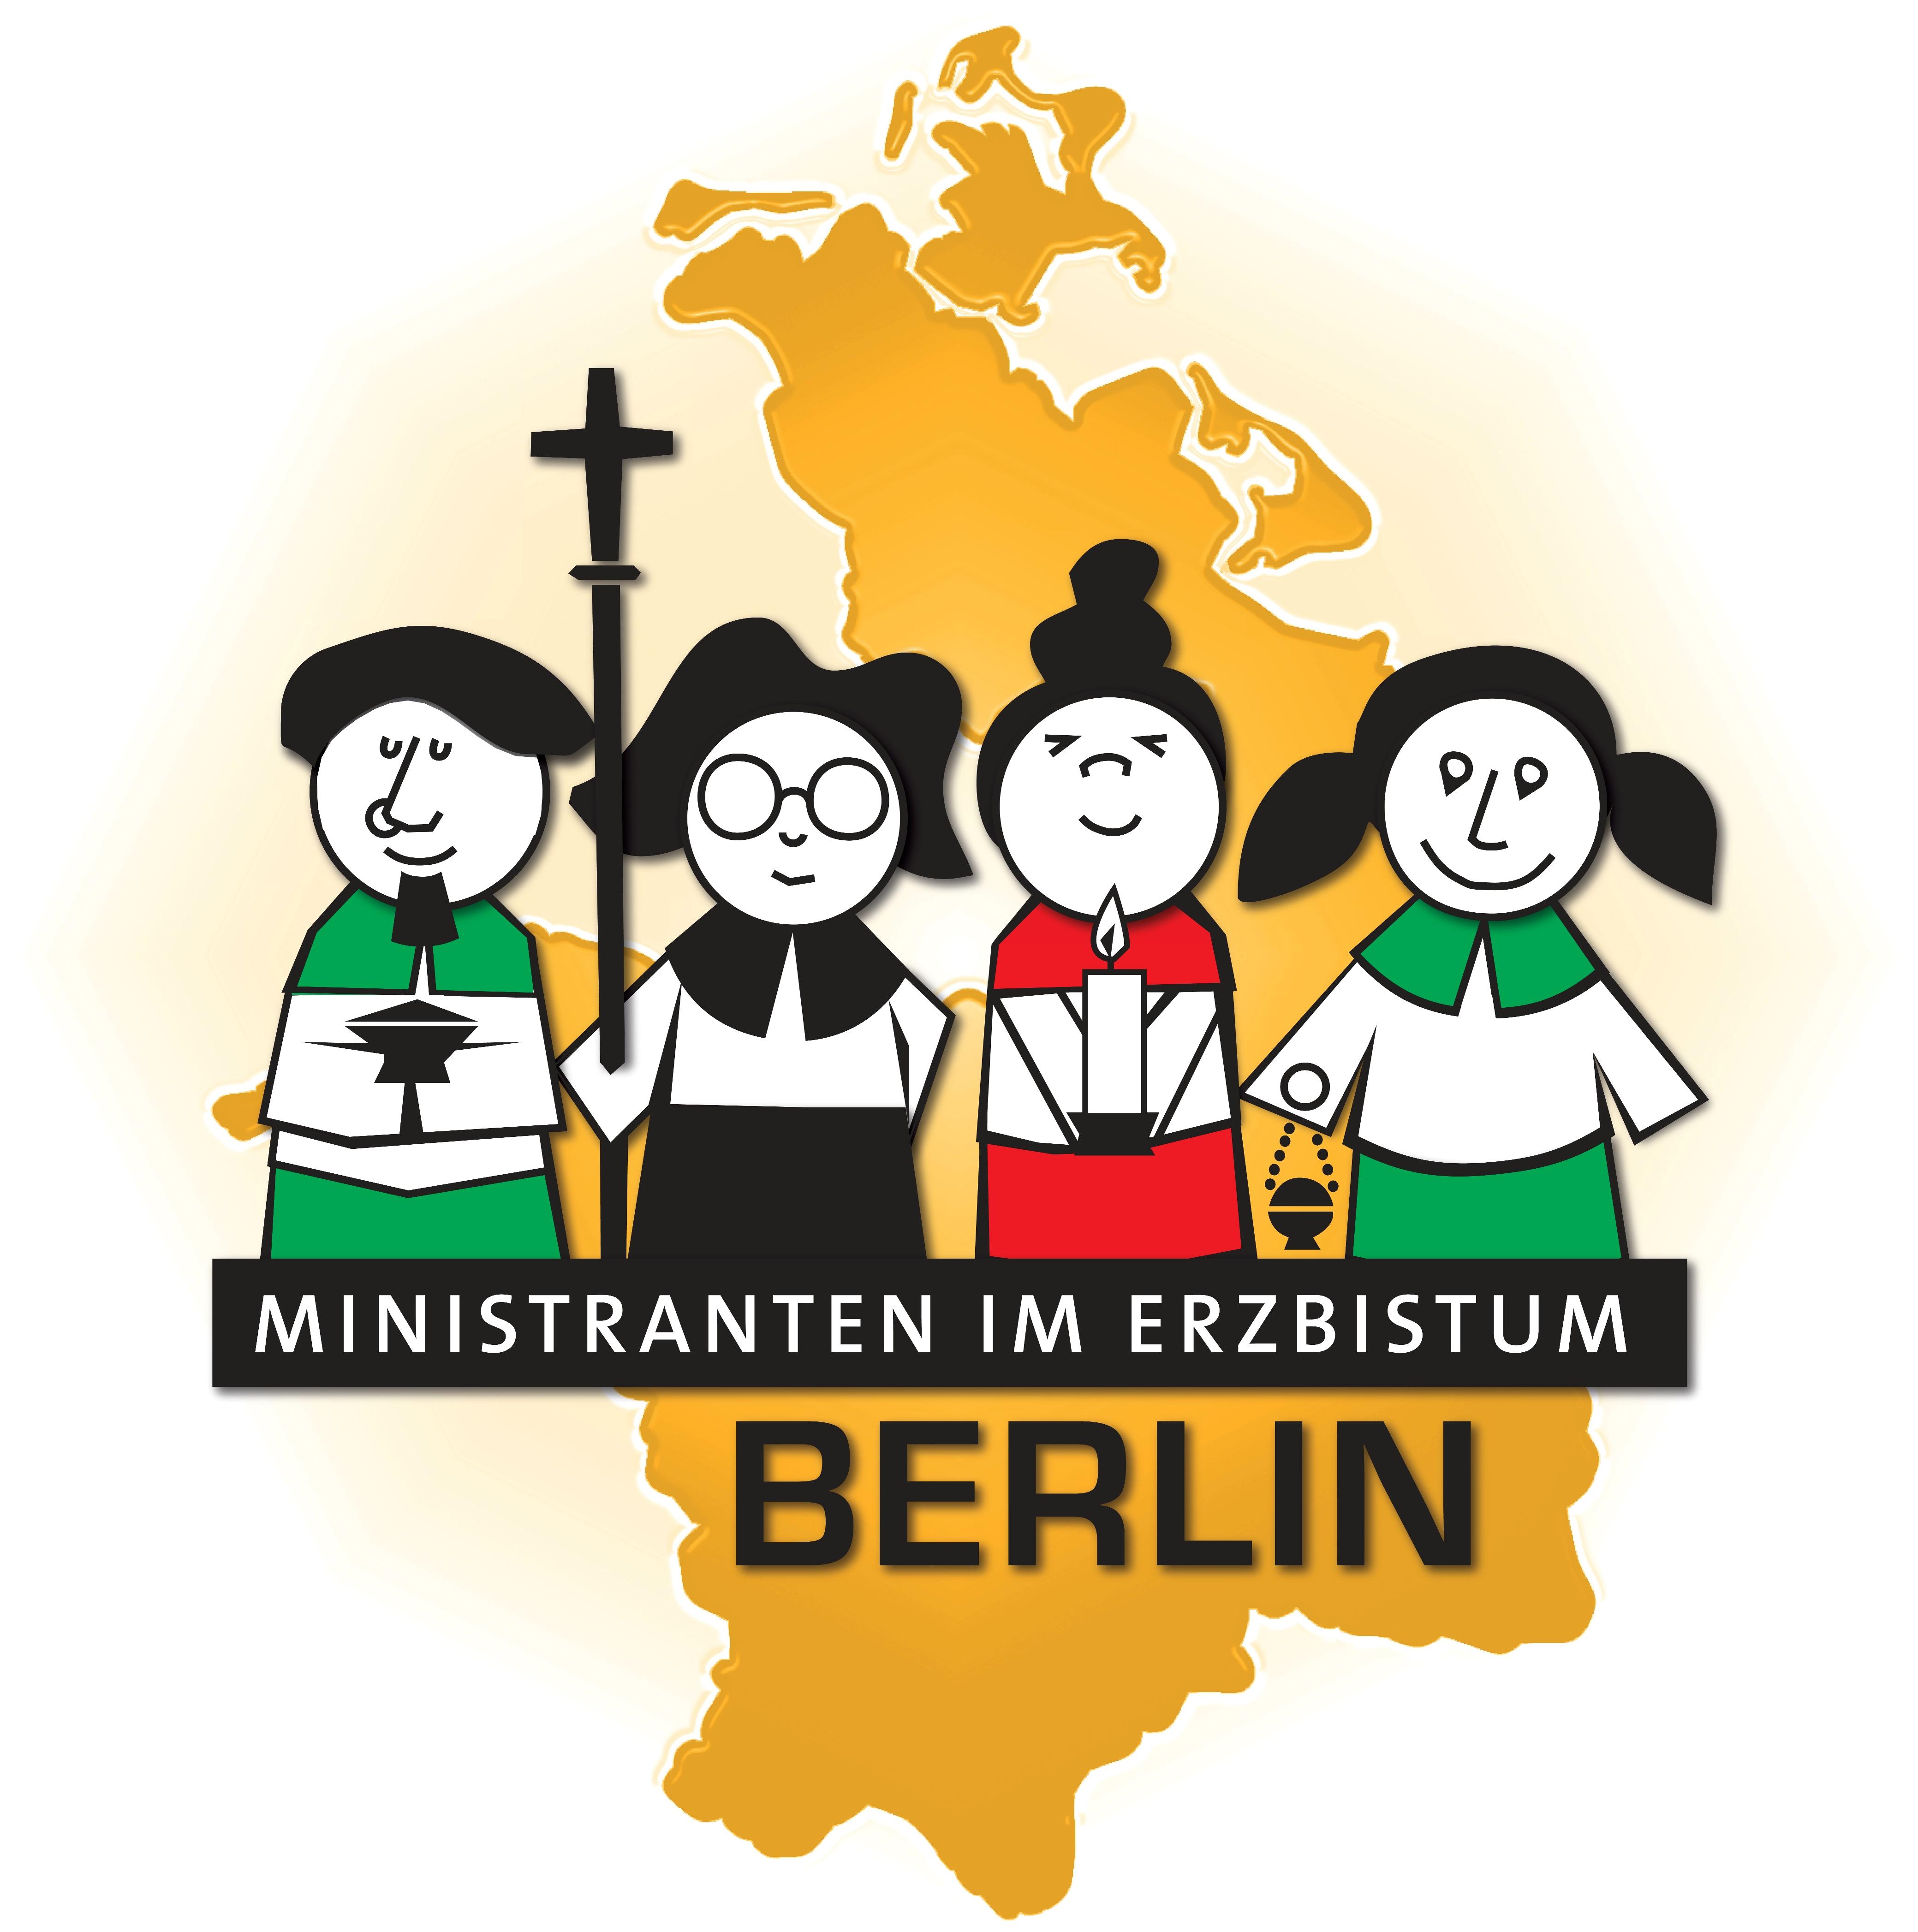 Ministranten im Erzbistum Berlin